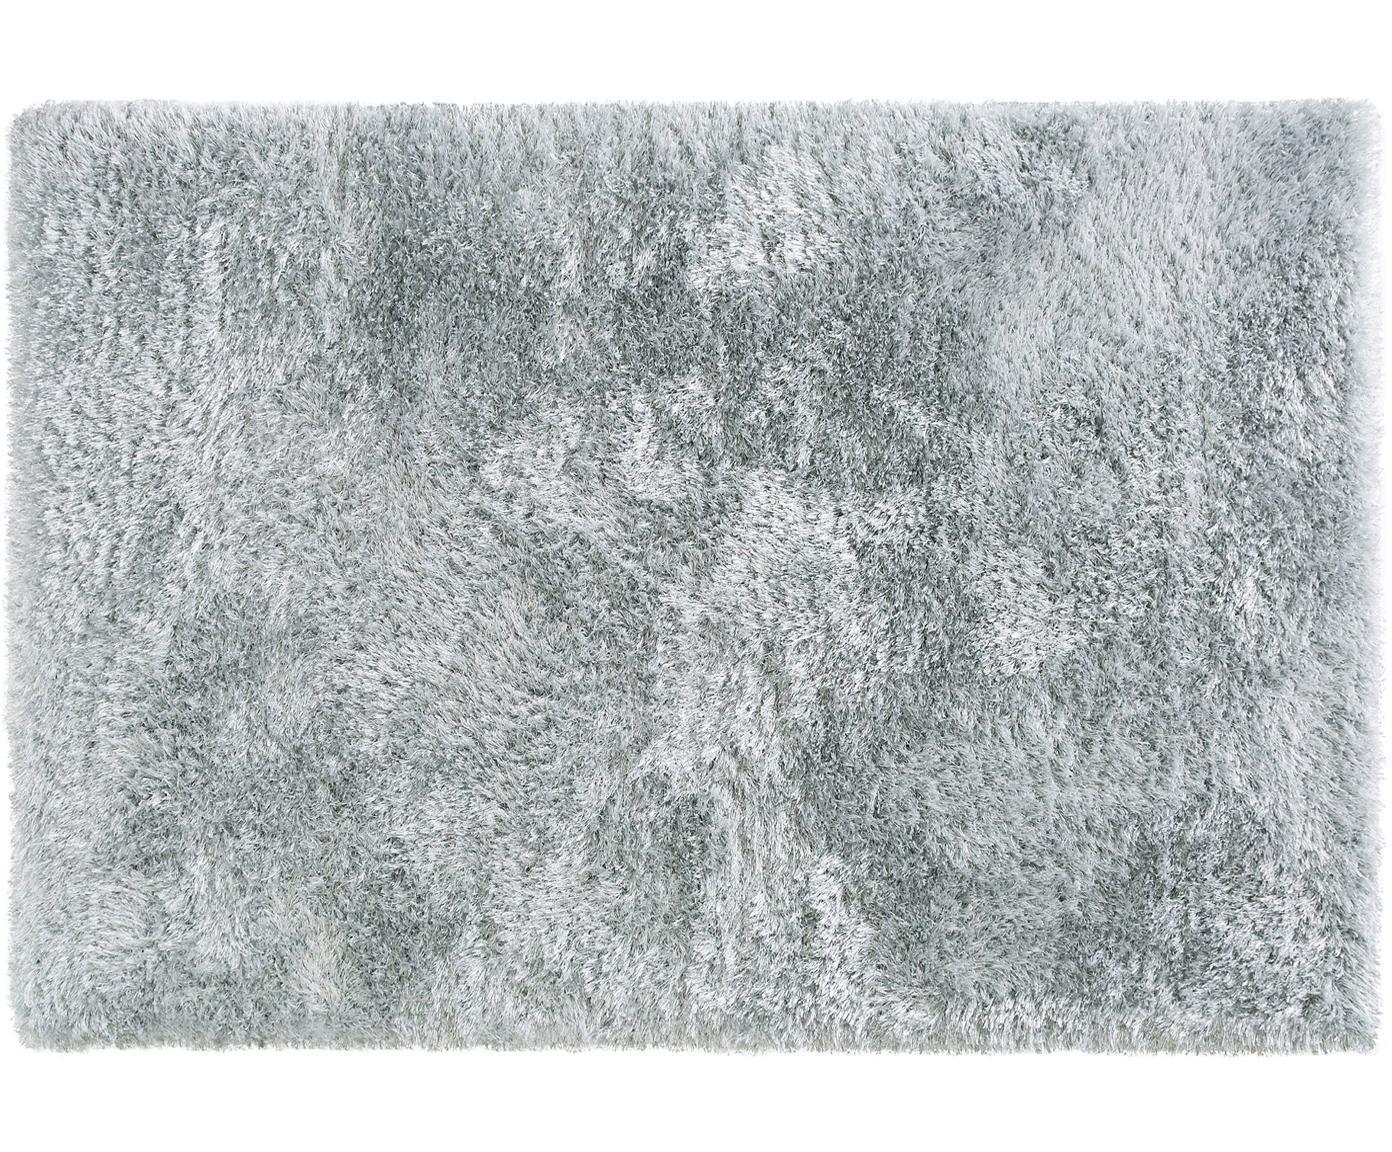 Glänzender Hochflor-Teppich Lea in Hellblau, 50% Polyester, 50% Polypropylen, Hellblau, B 160 x L 230 cm (Größe M)